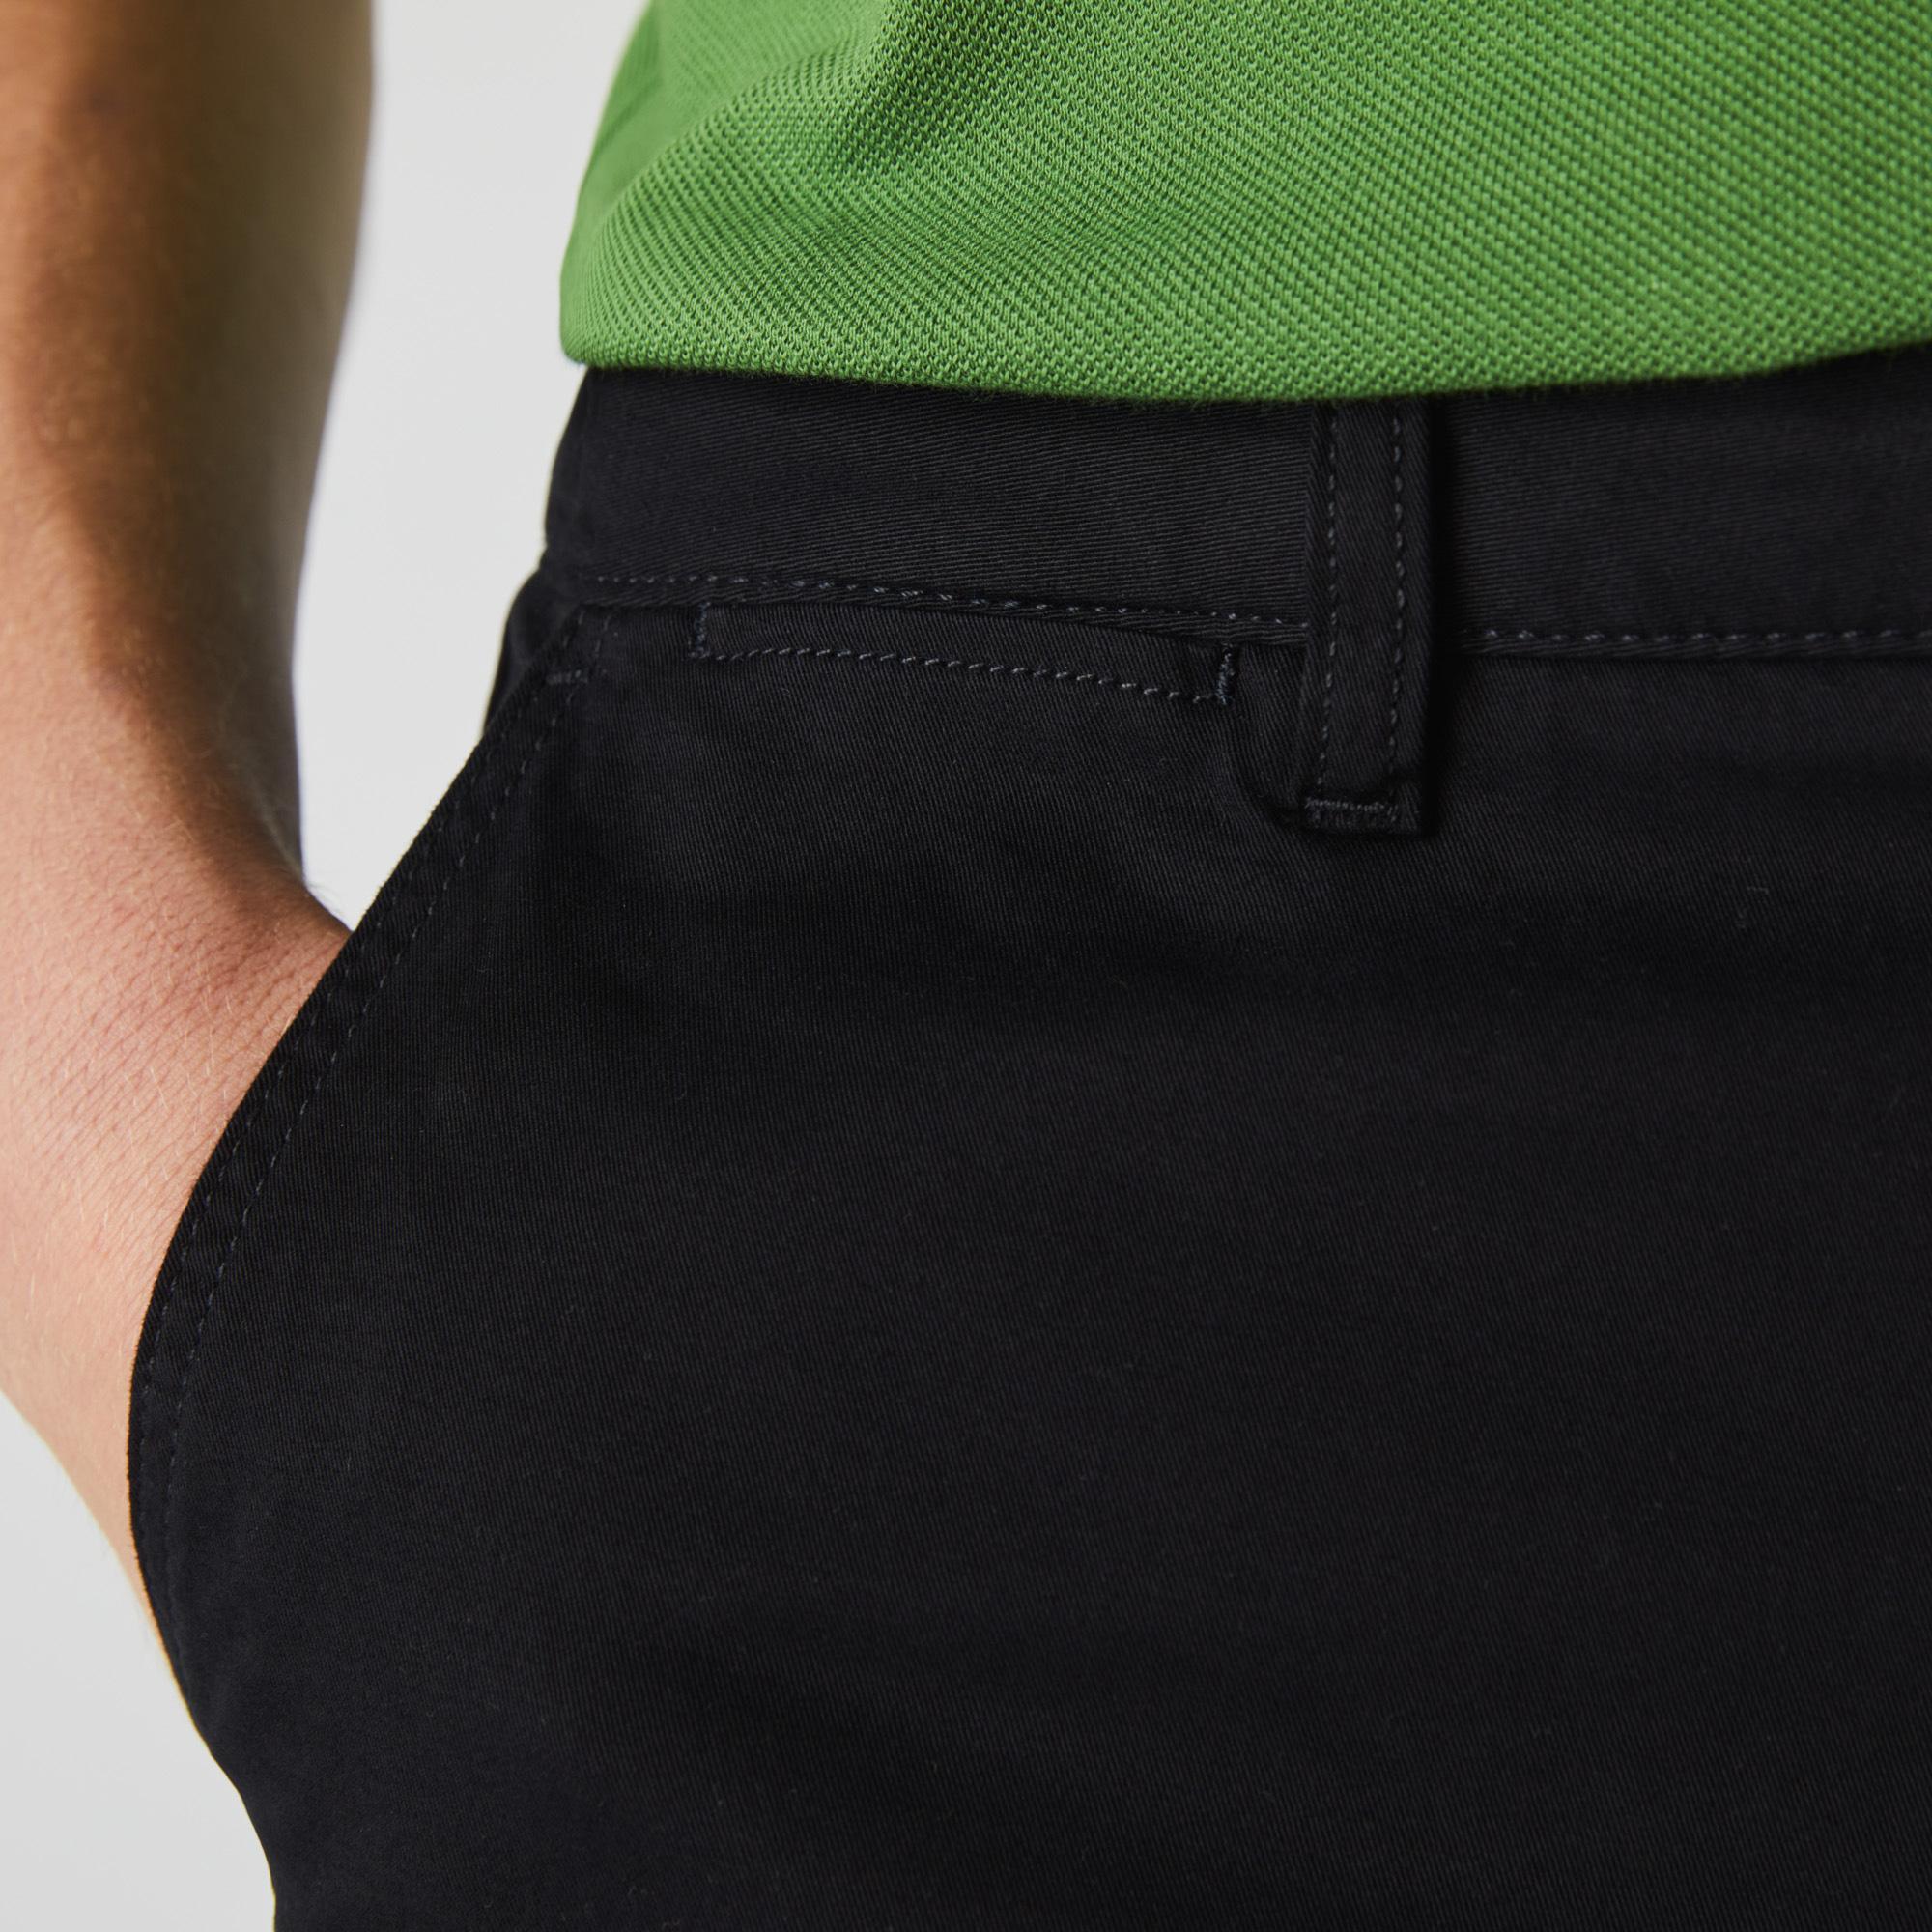 Lacoste Men's Slim Fit Stretch Gabardine Chino Pants